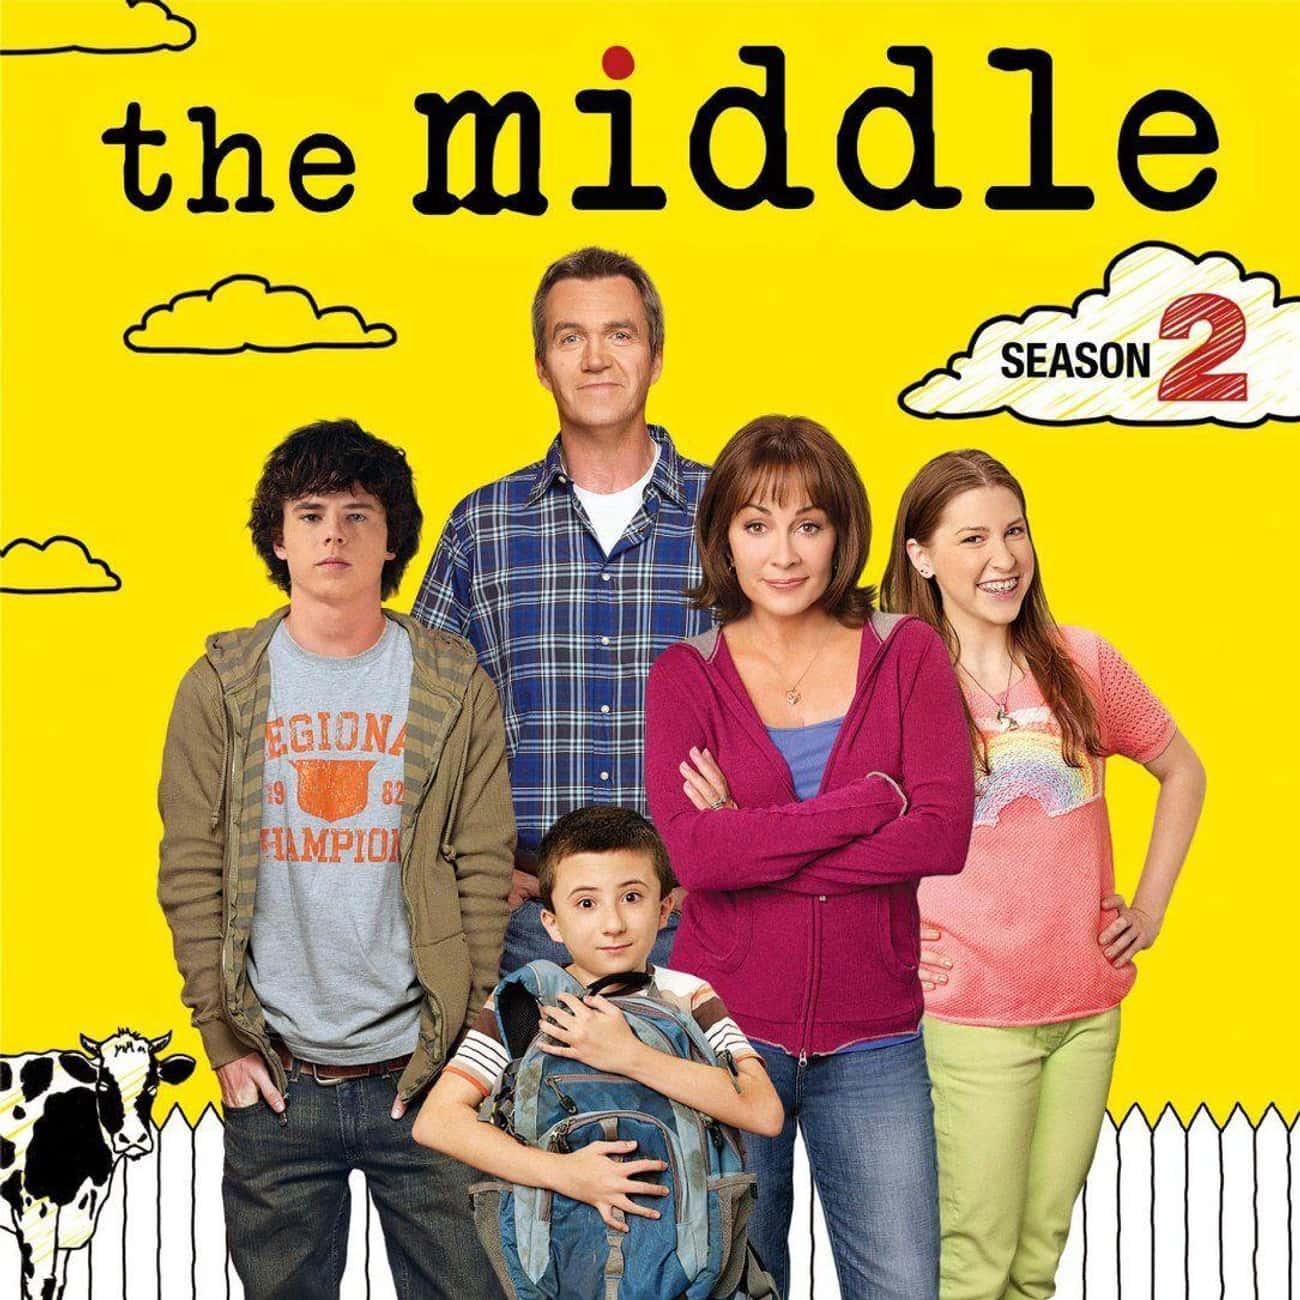 The Middle - Season 2